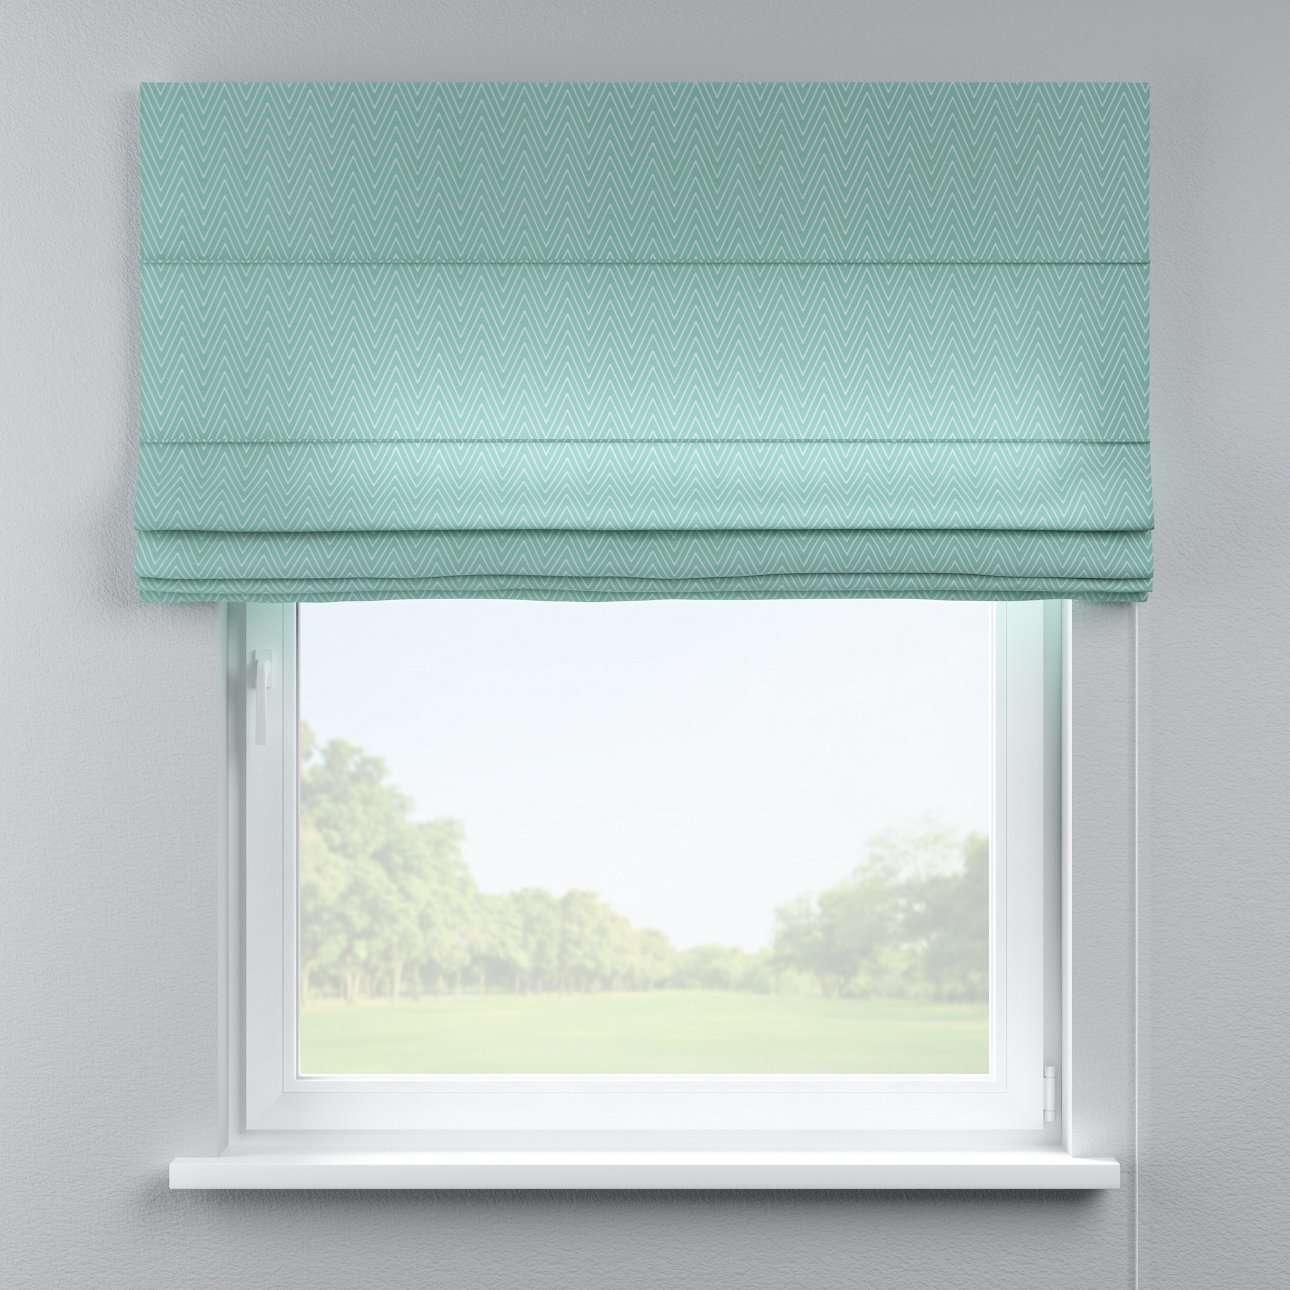 Romanetės Capri 80 x 170 cm (plotis x ilgis) kolekcijoje Brooklyn, audinys: 137-90